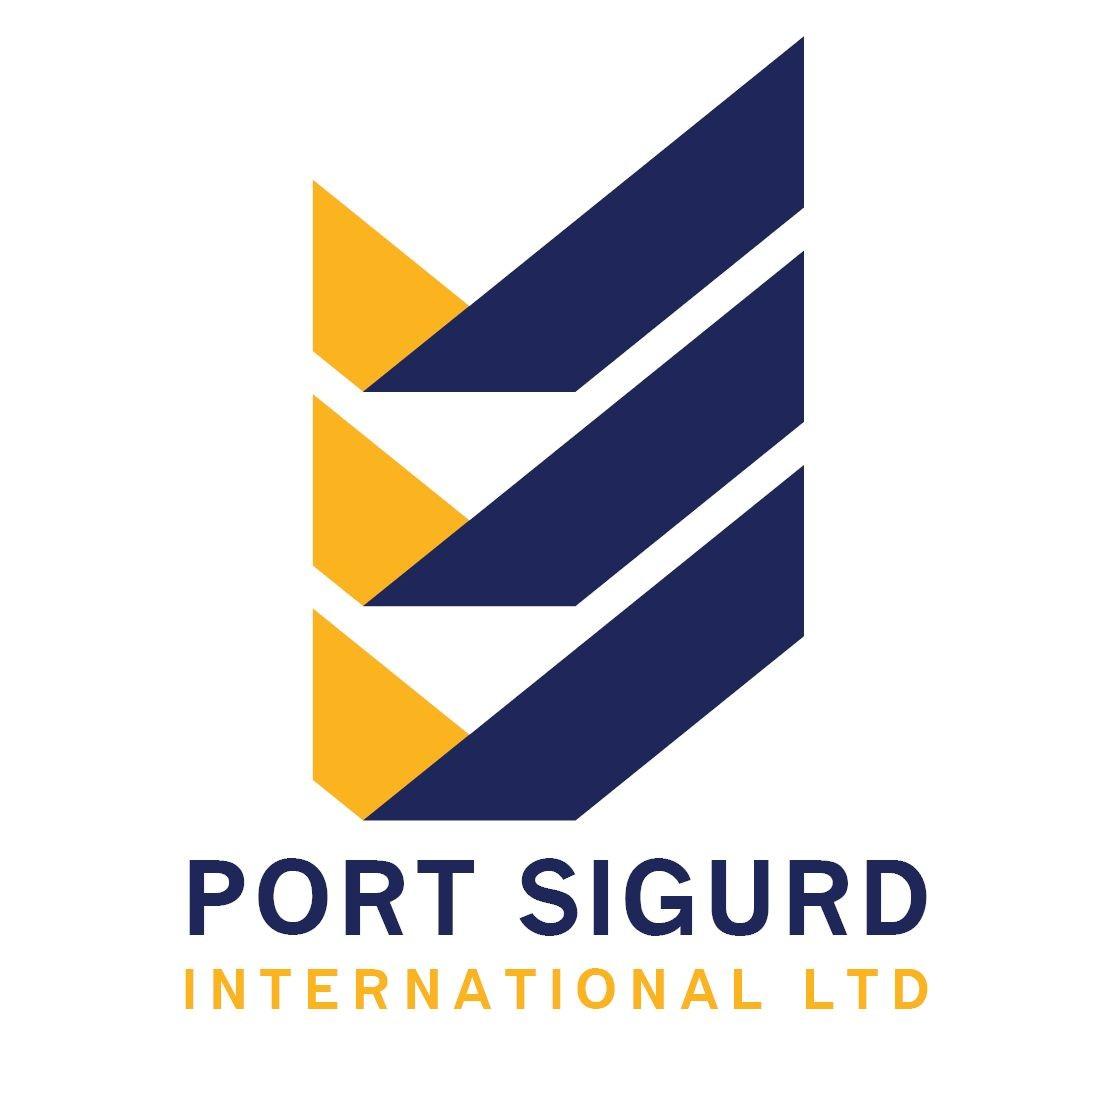 Port Sigurd International Ltd